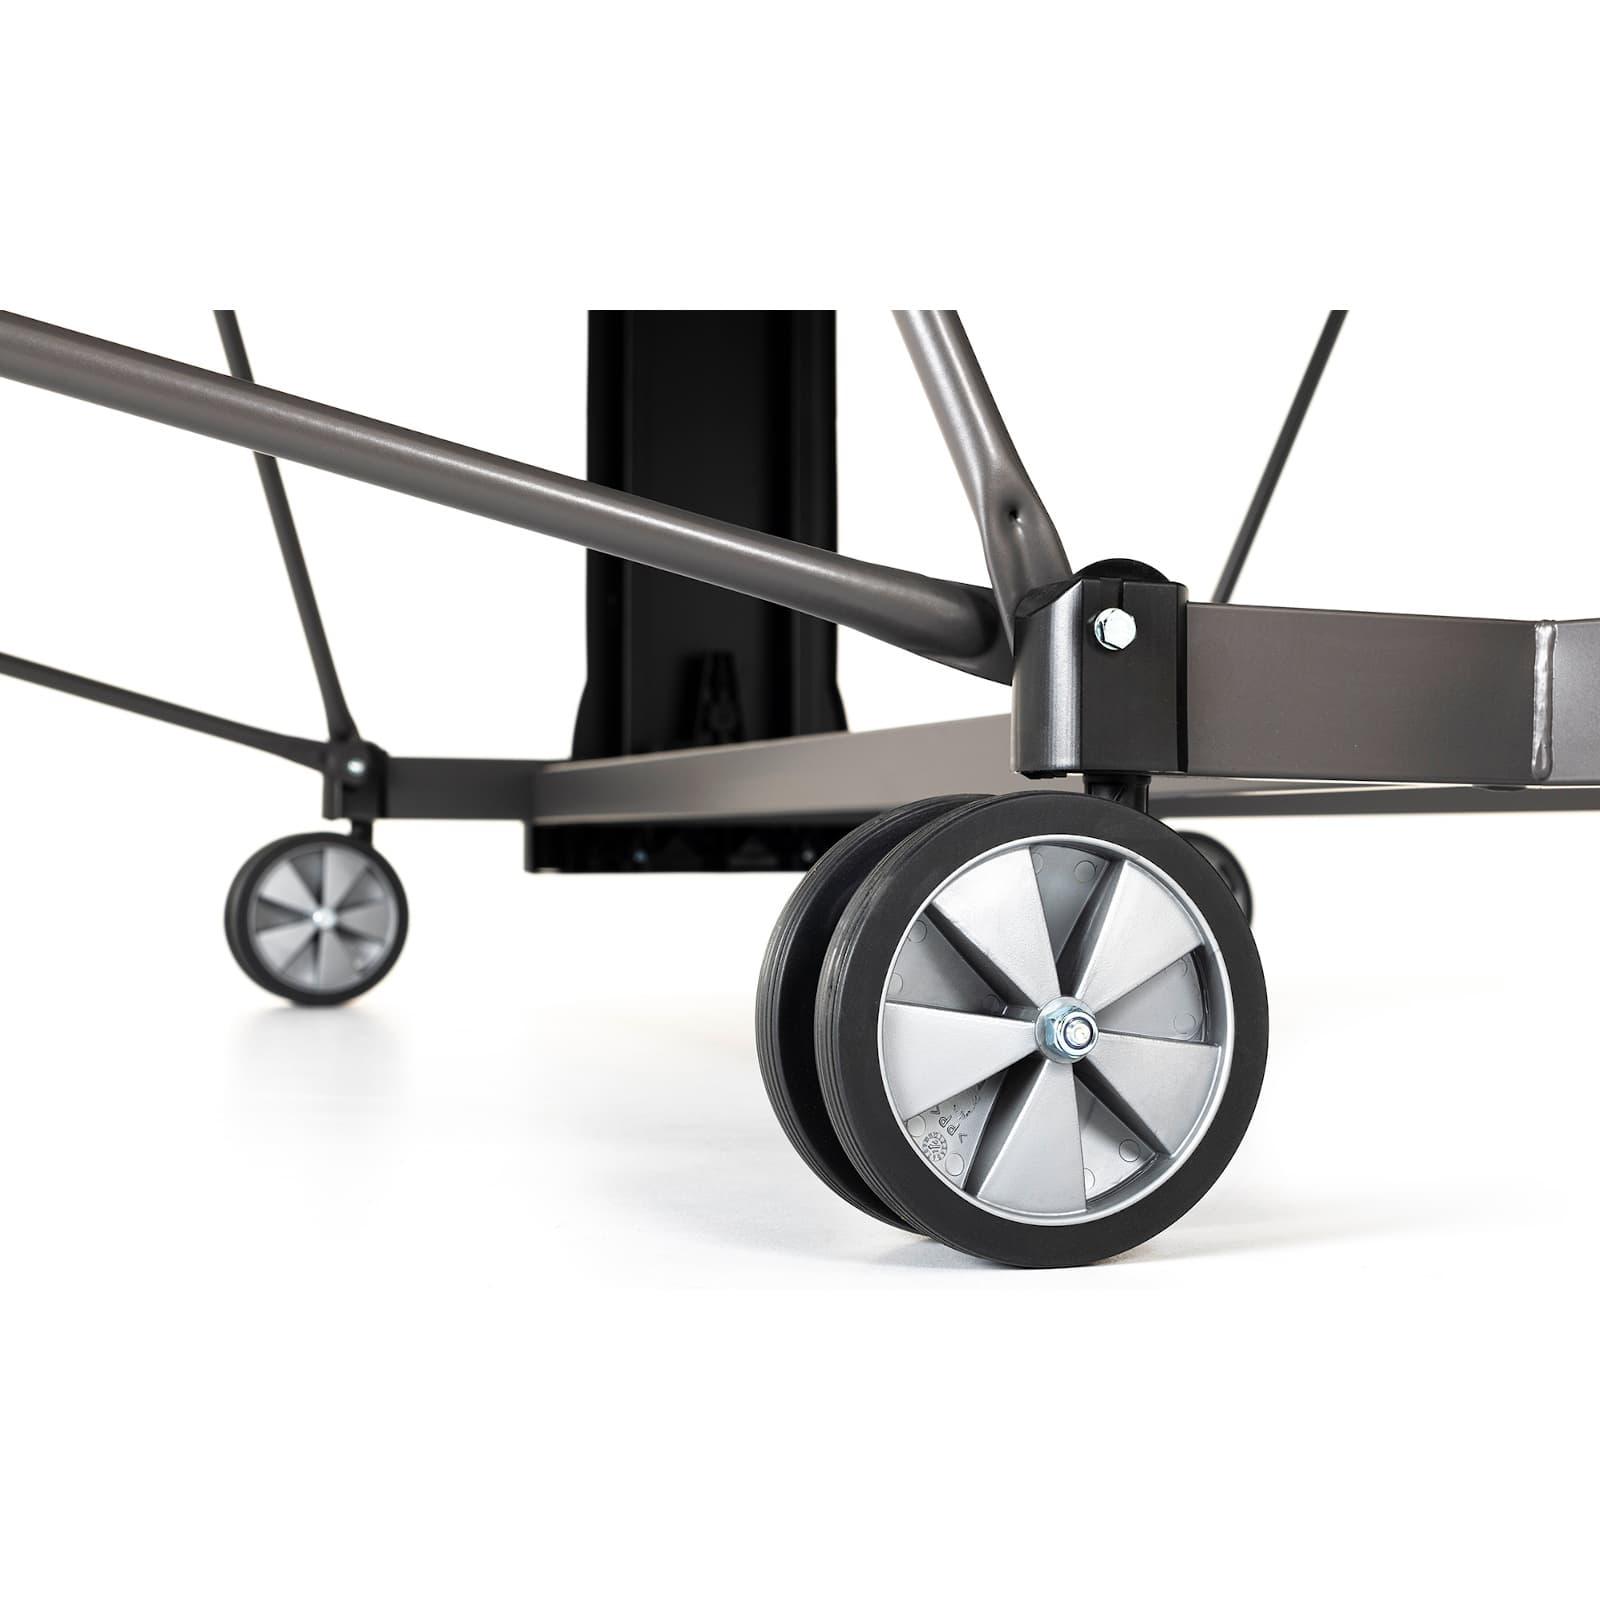 Kettler TT-Tisch Outdoor 5 - Doppelräder